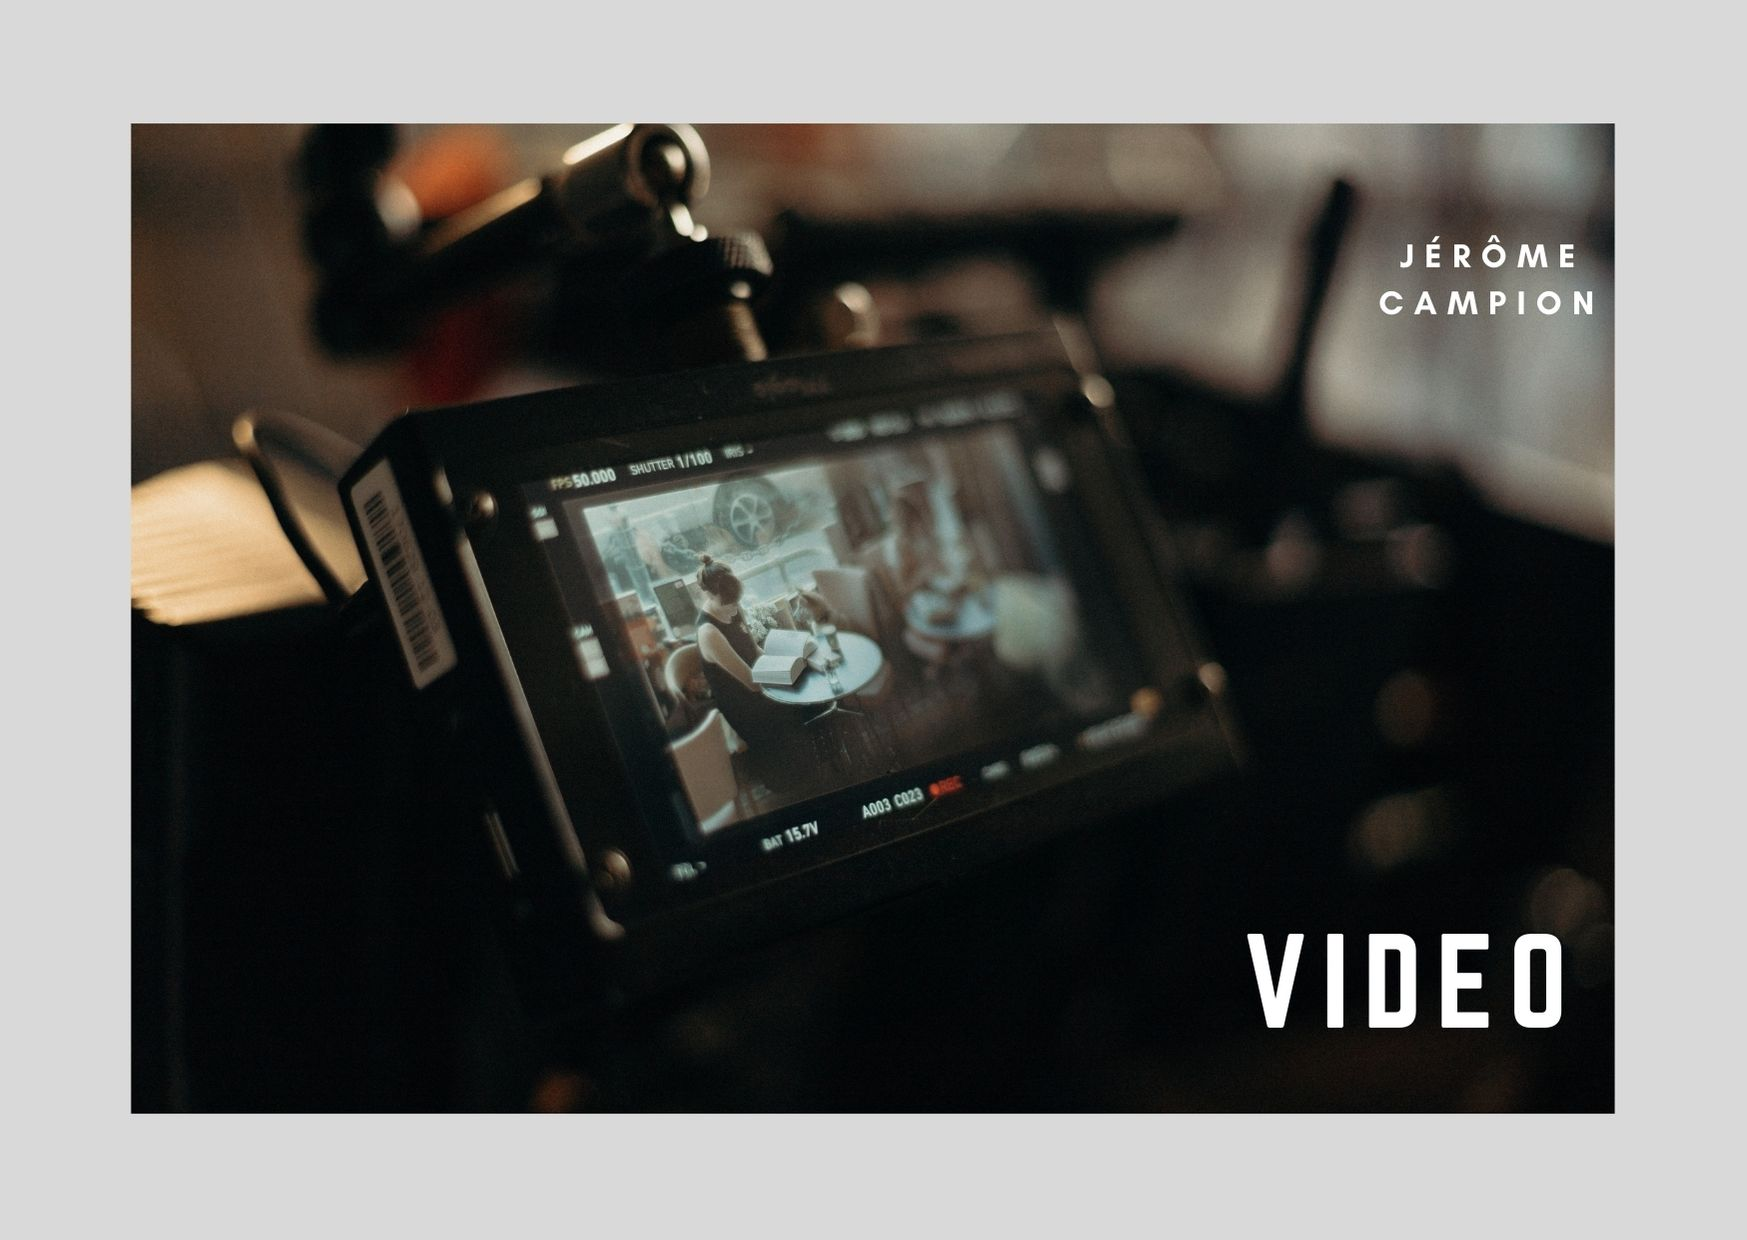 Vidéo - Jérôme Campion